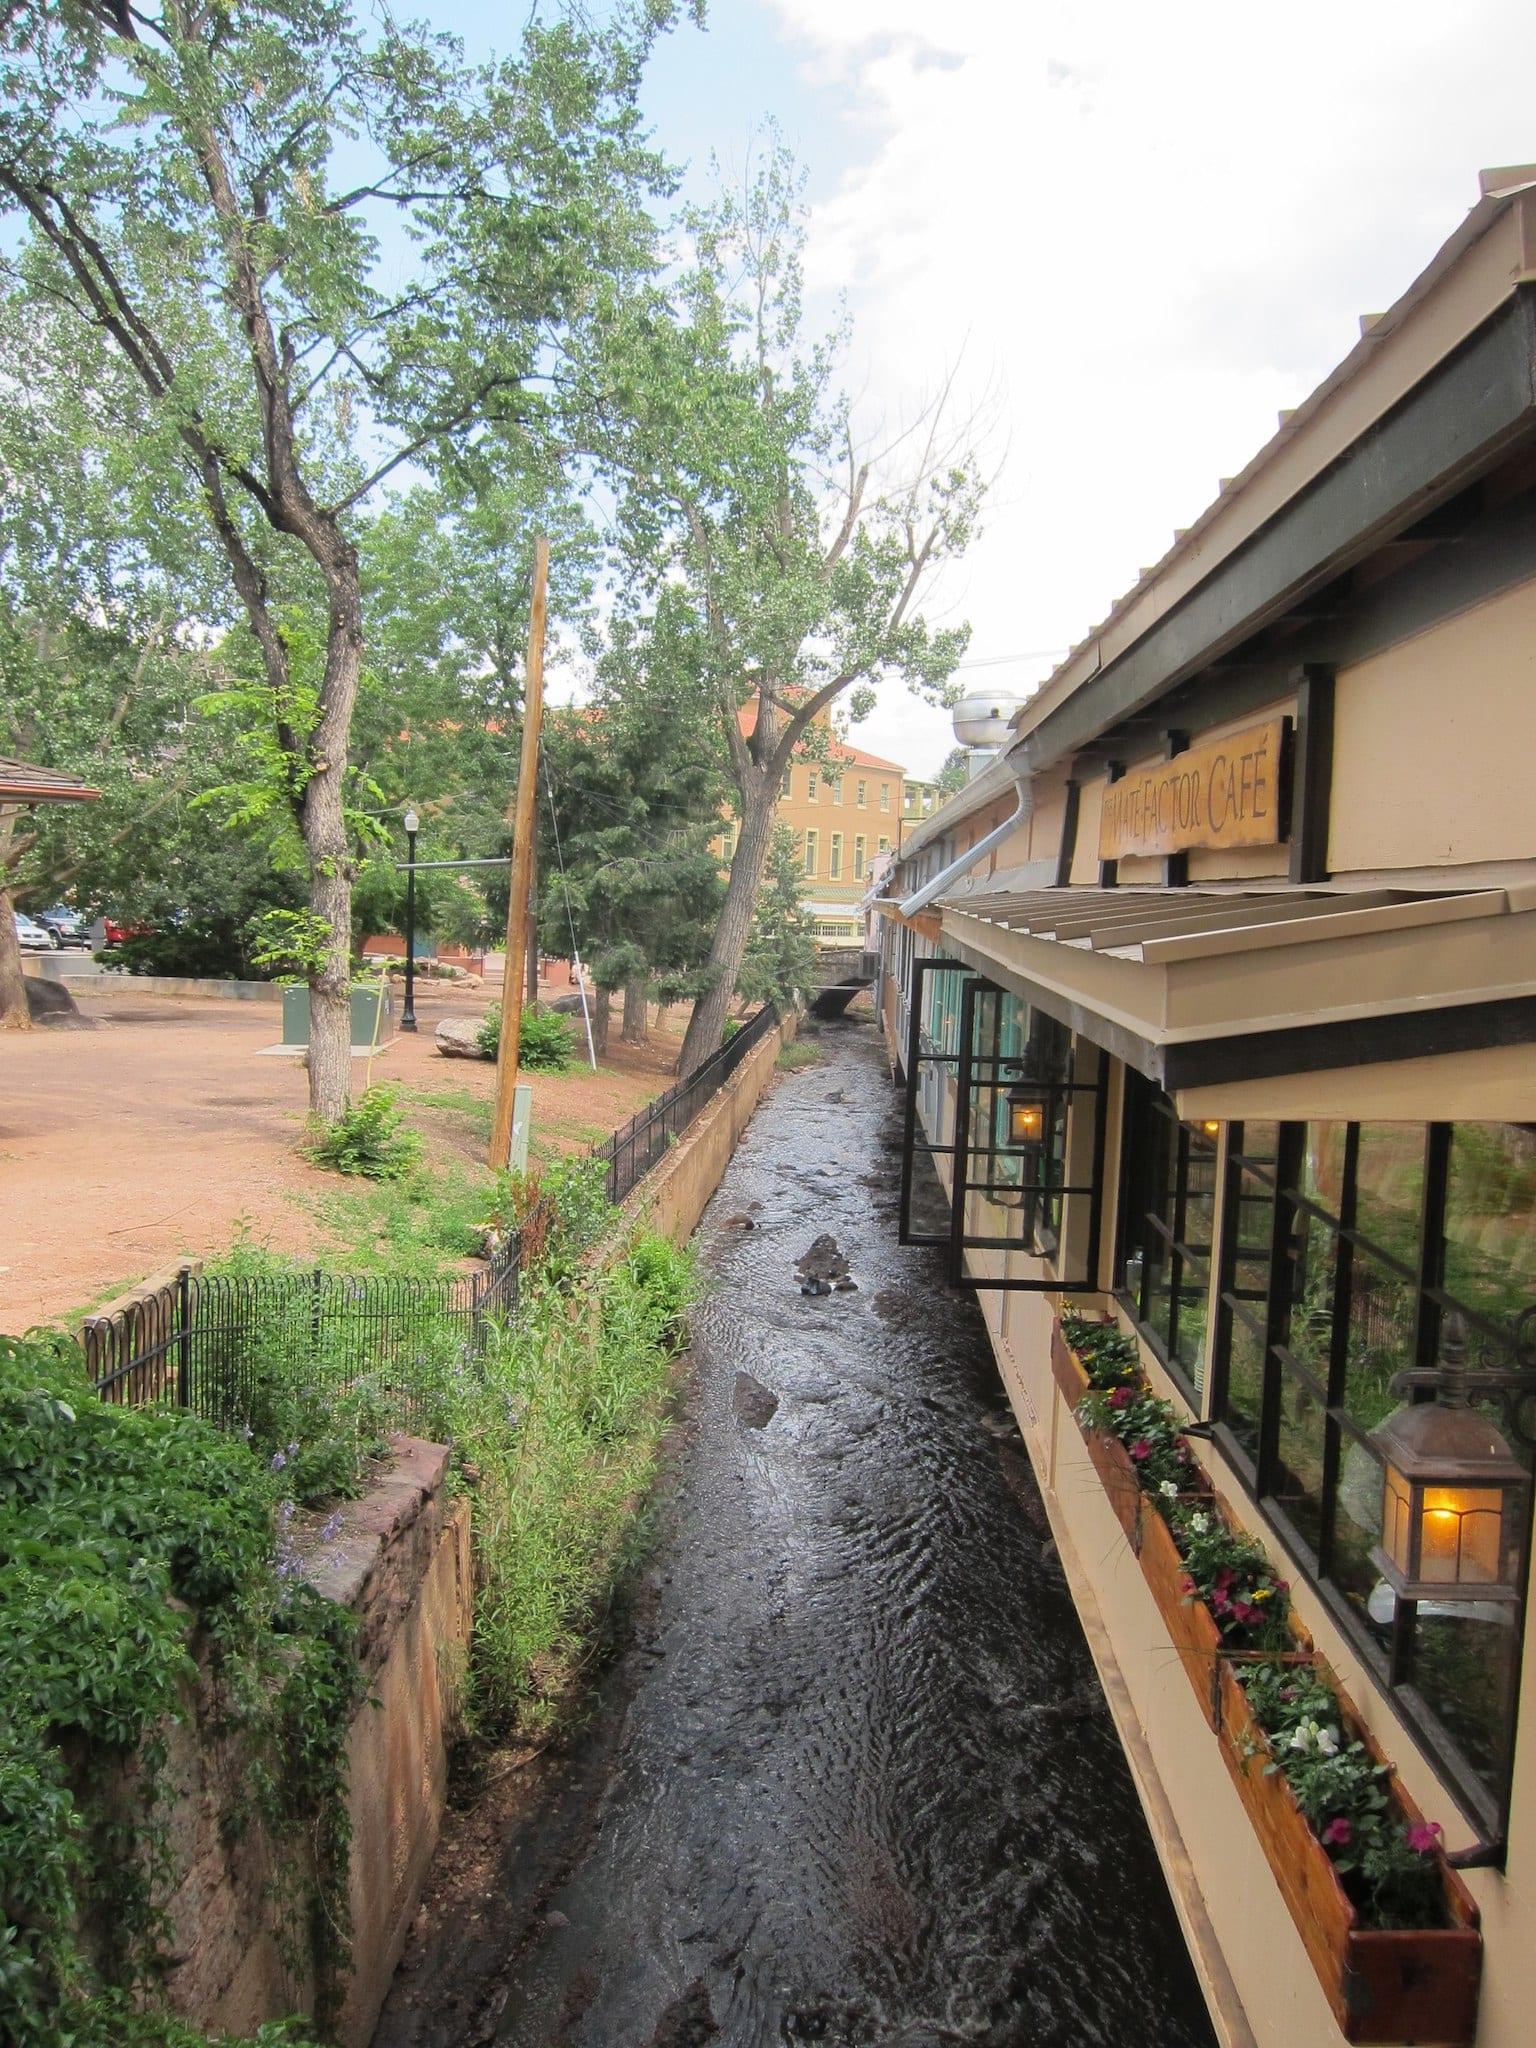 Fountain Creek Manitou Springs Colorado